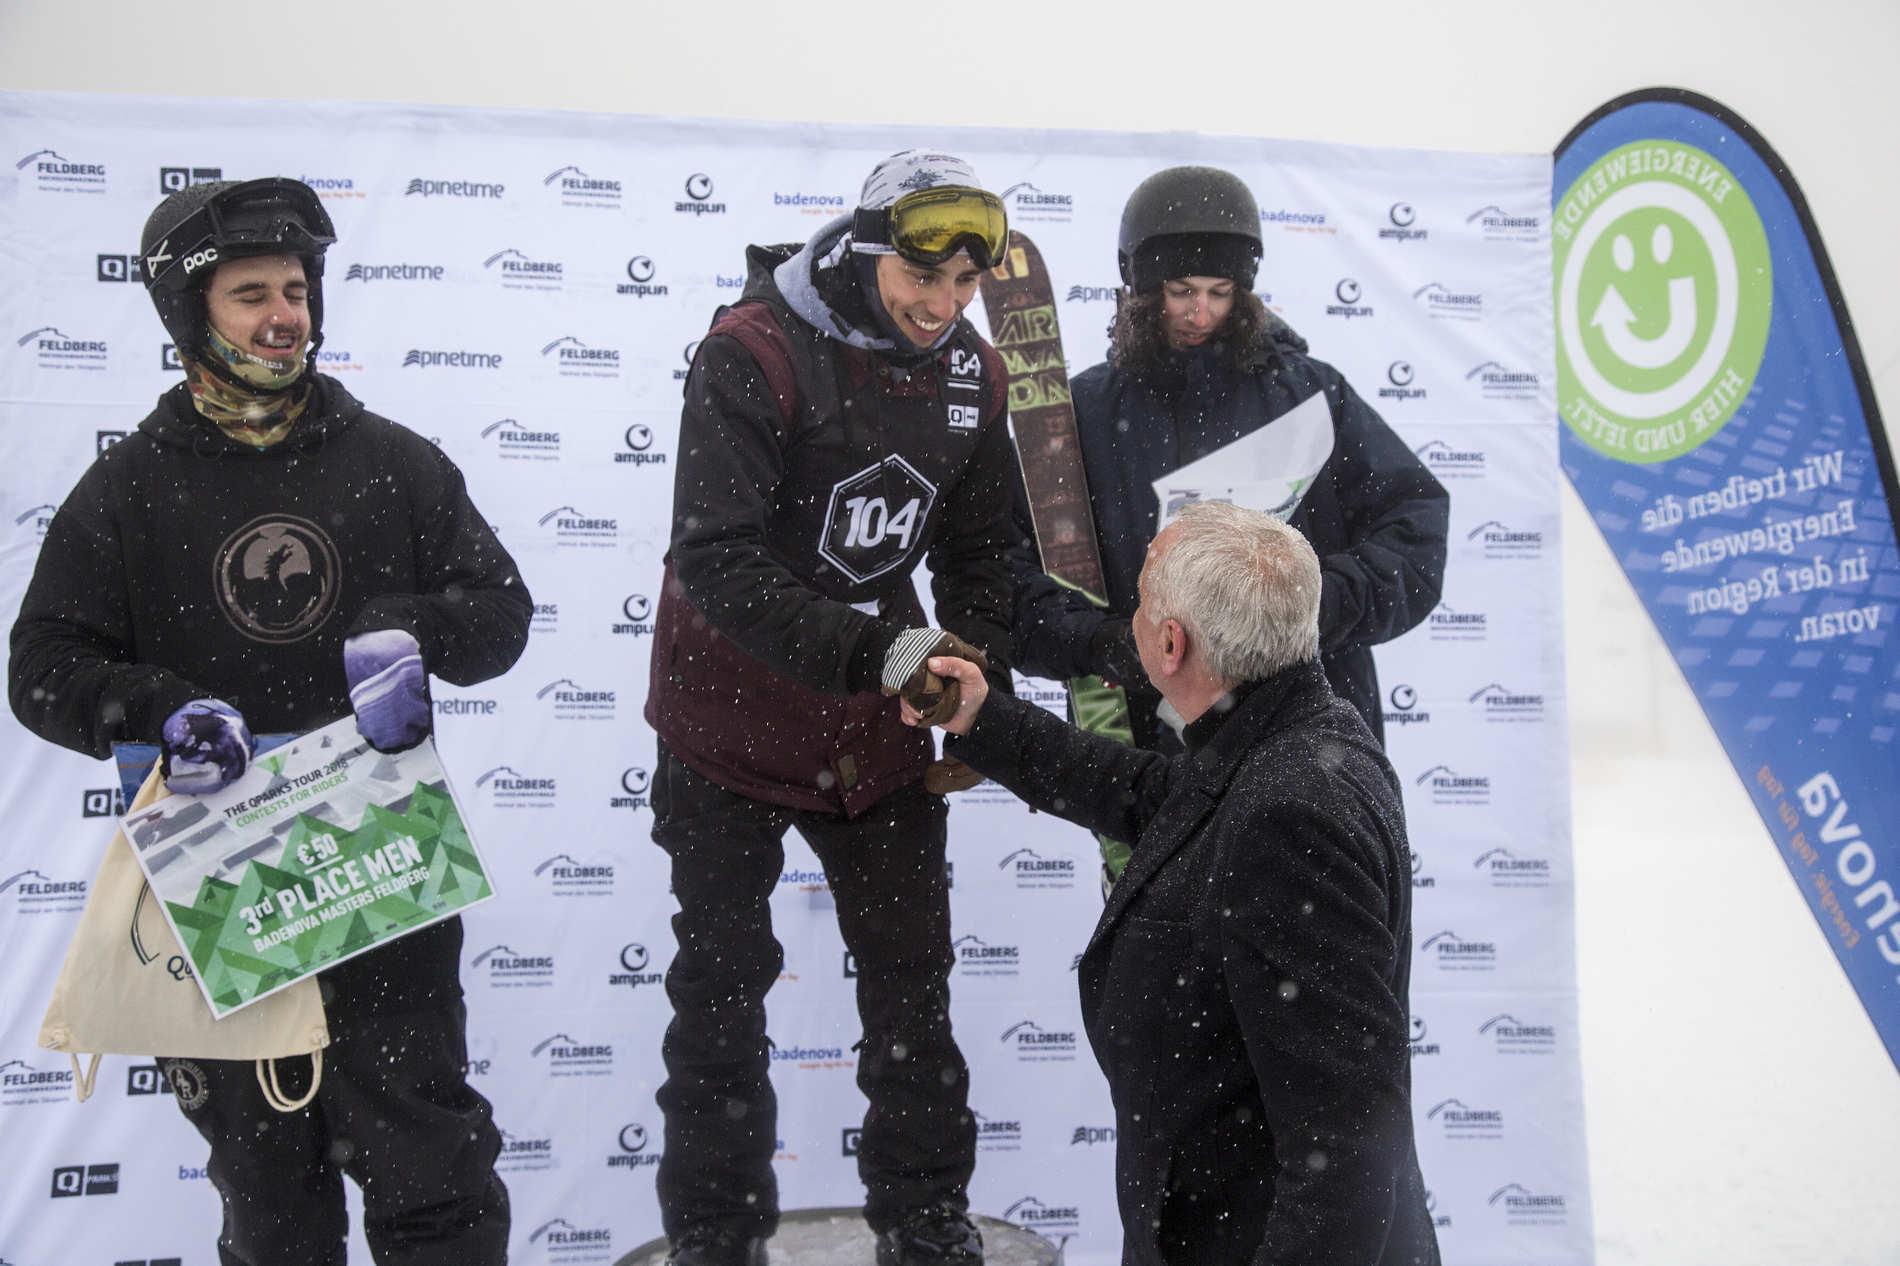 web snowpark feldberg 17 02 2018 lifestyle fs sb martin herrmann qparks 18